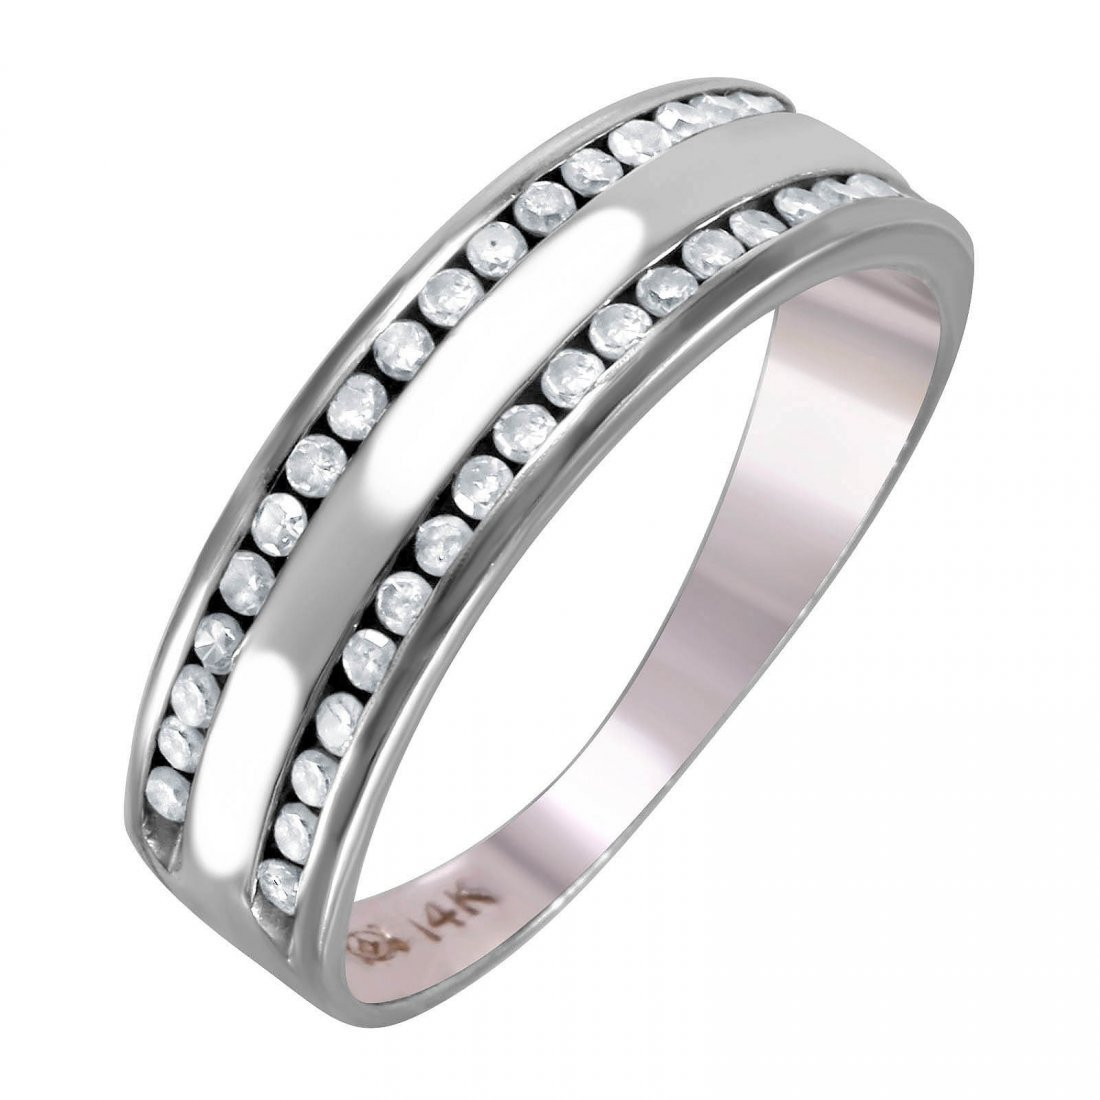 14K White Gold Diamond Wedding Band, Size 5